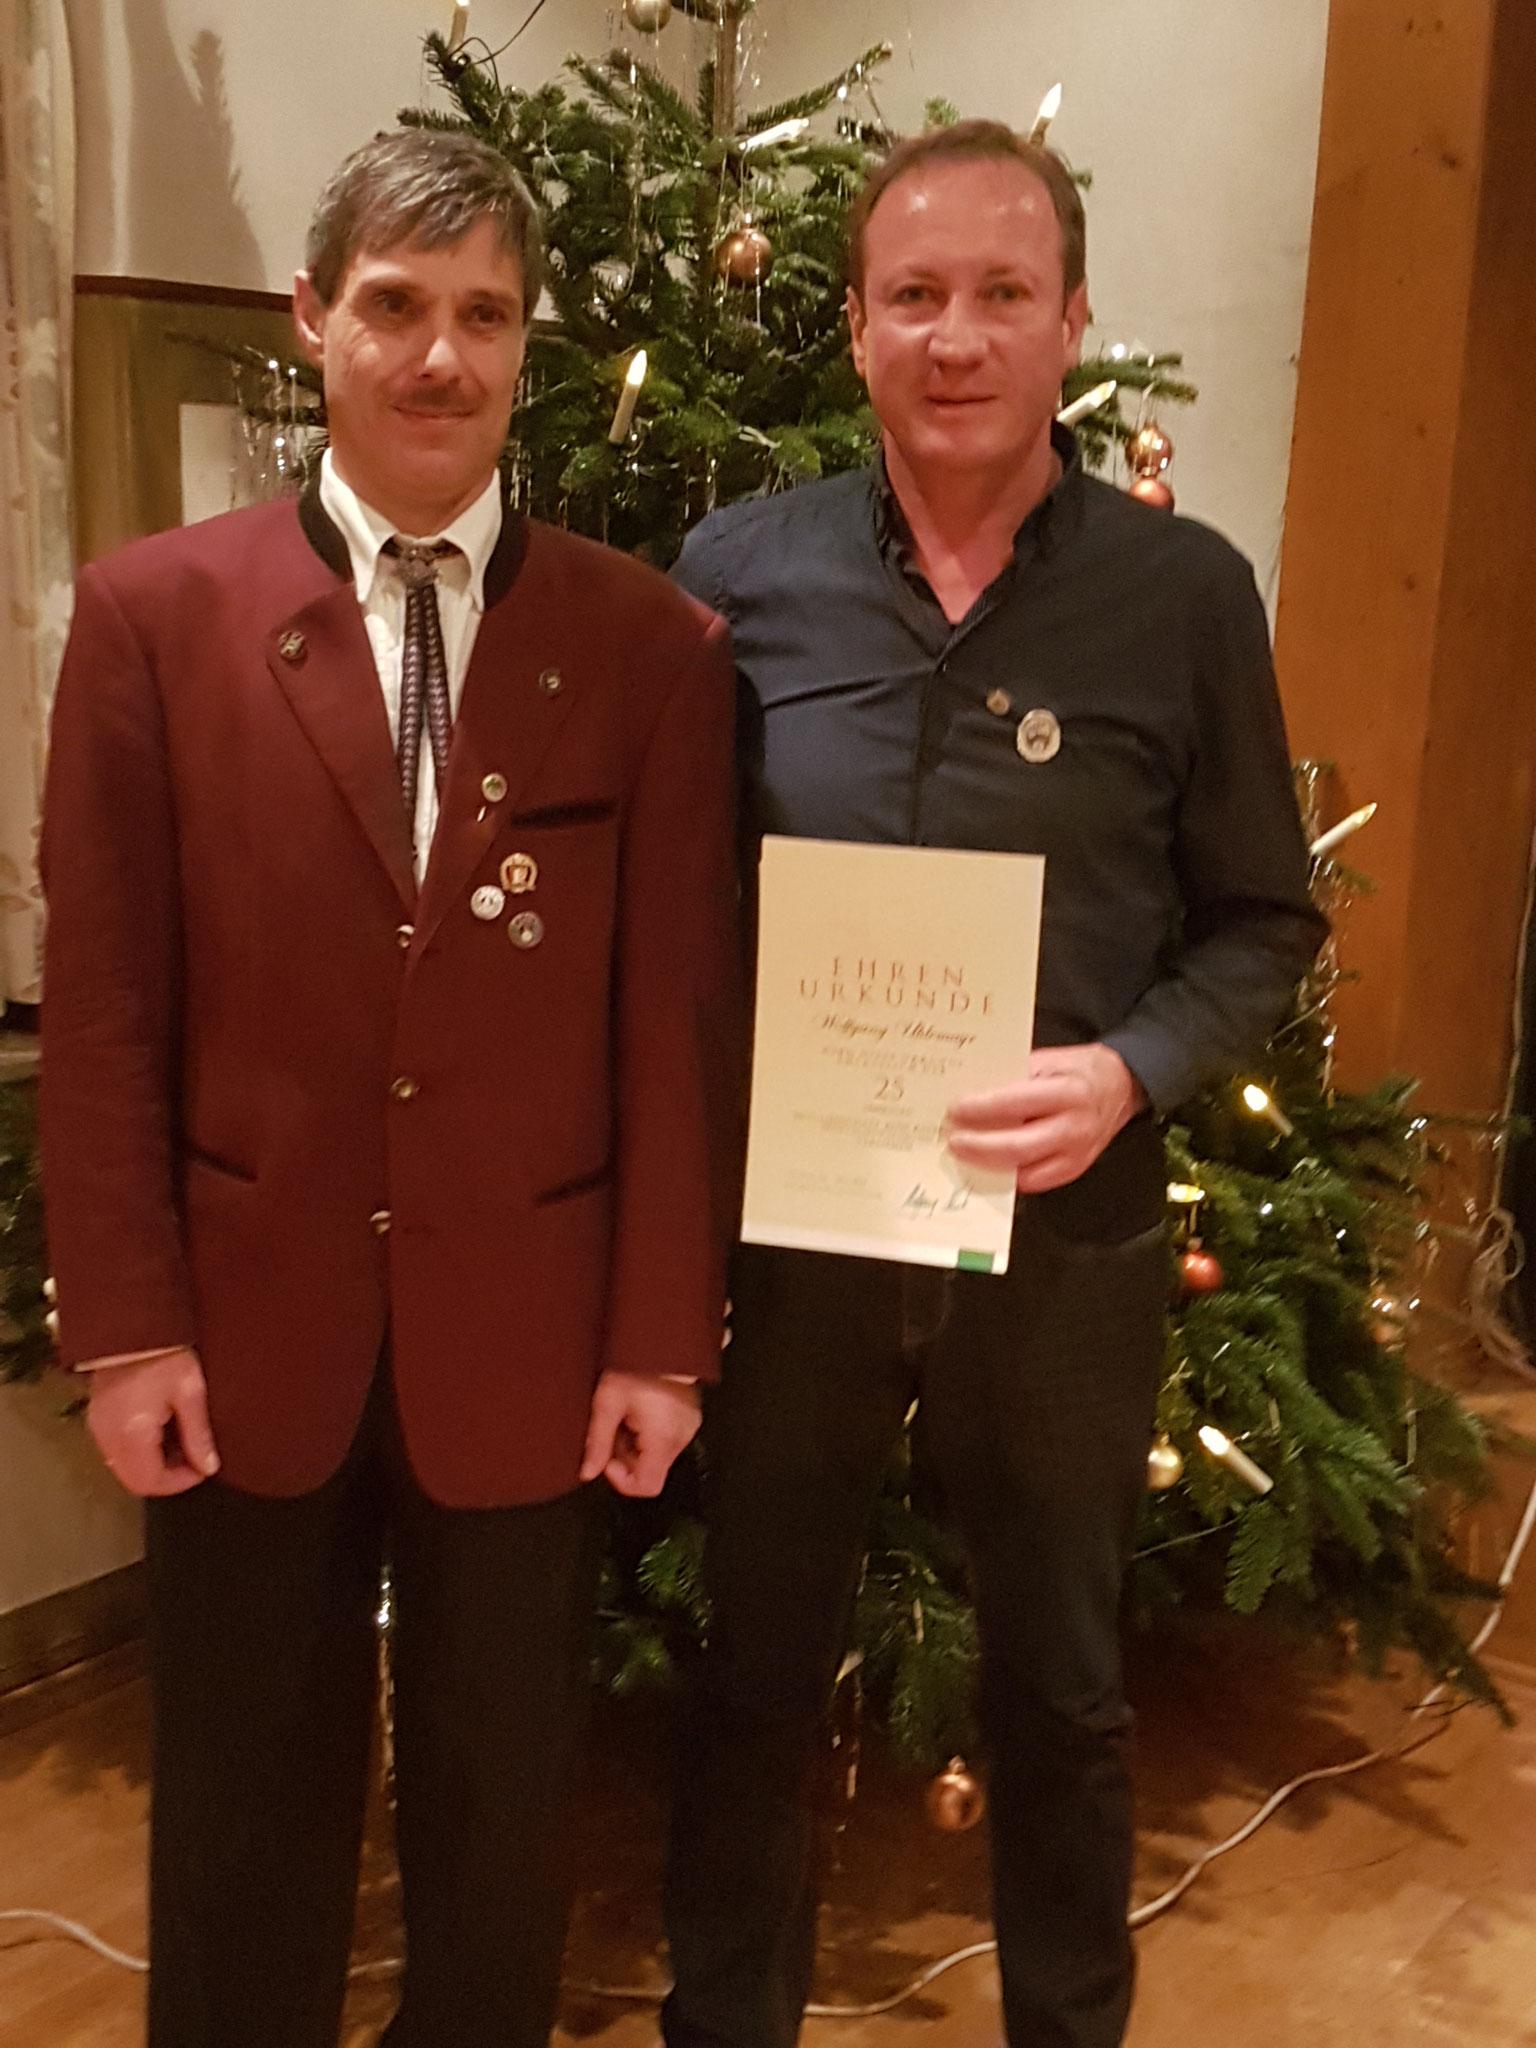 Uhlemayr Wolfgang 25 Jahre Mitgliedschaft